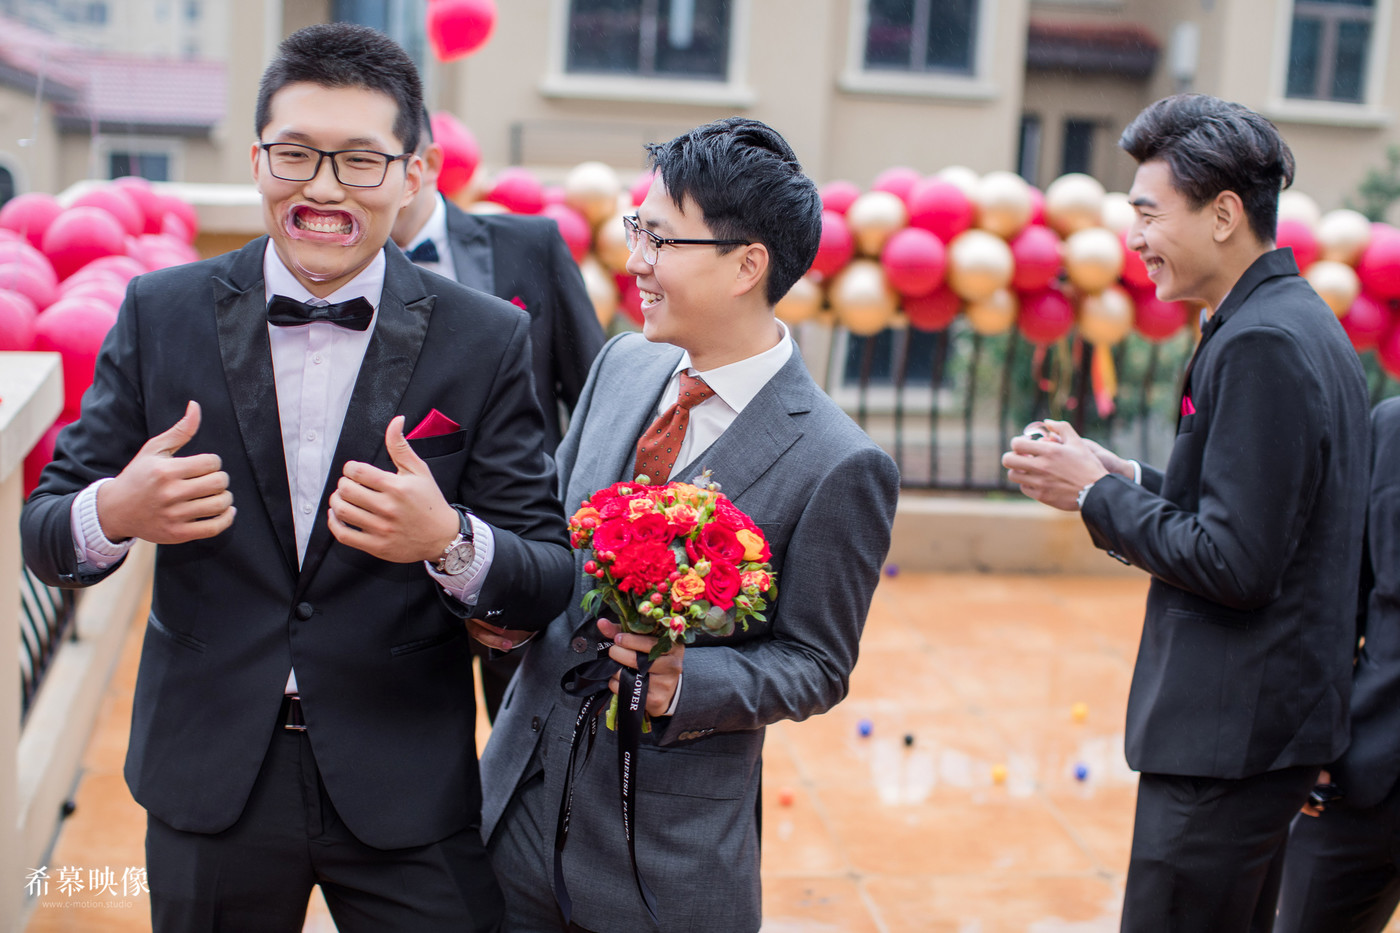 Pitt&Lcr's Wedding day17